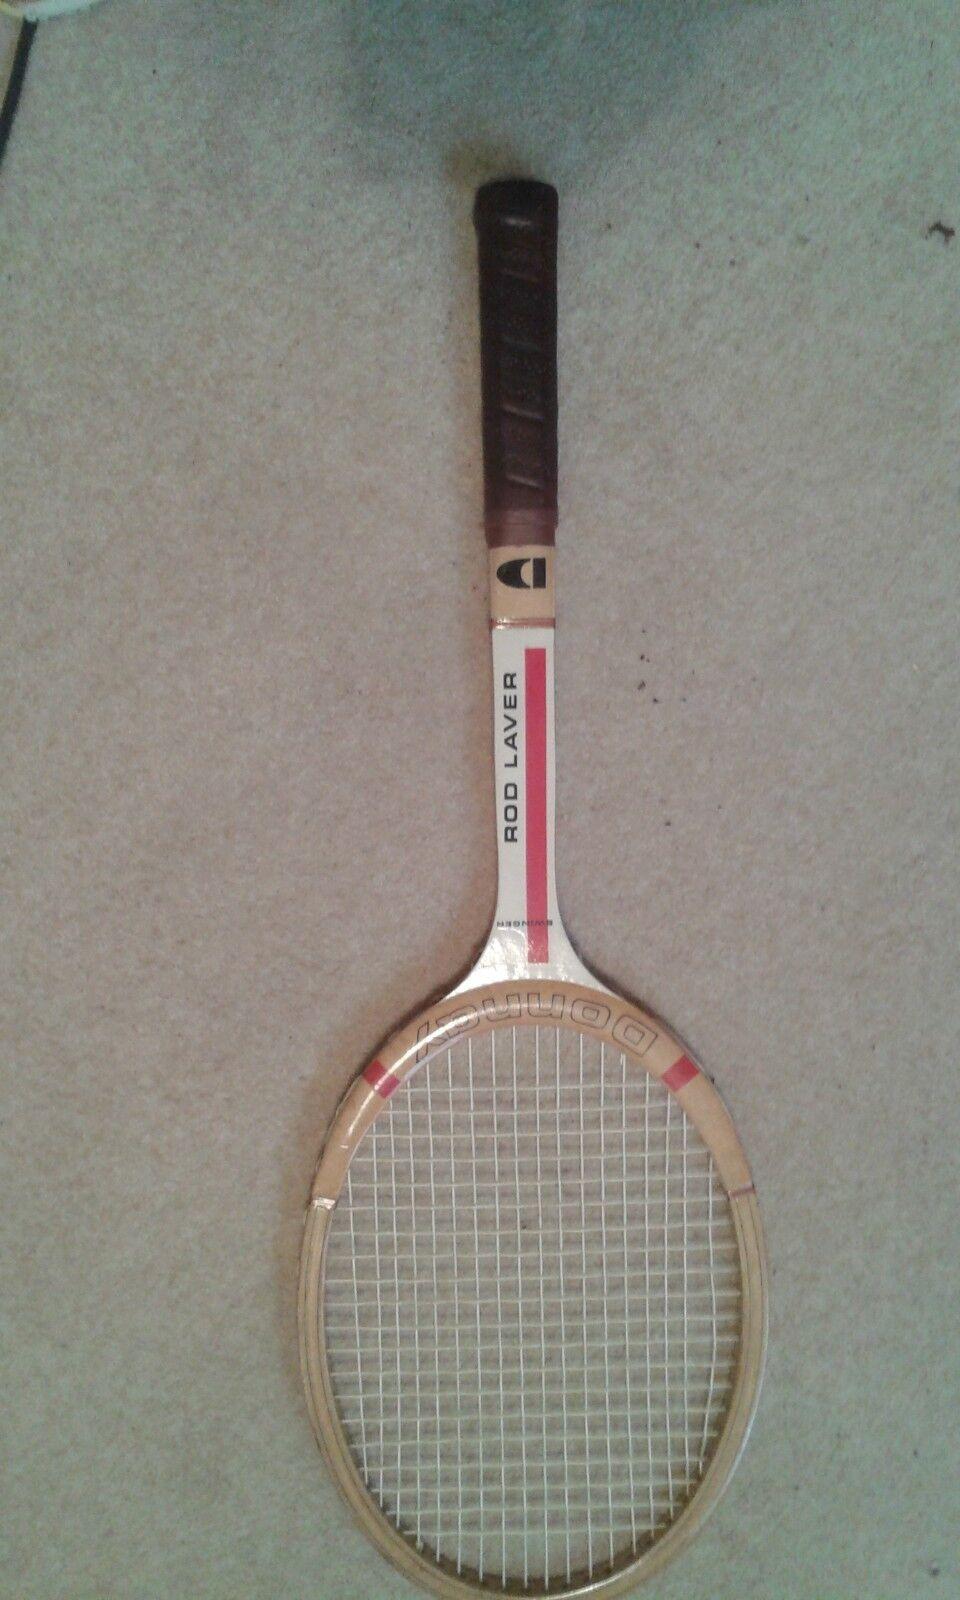 Donnay Rod LaverSwinger Tennis Racket, rare, vintage, wooden